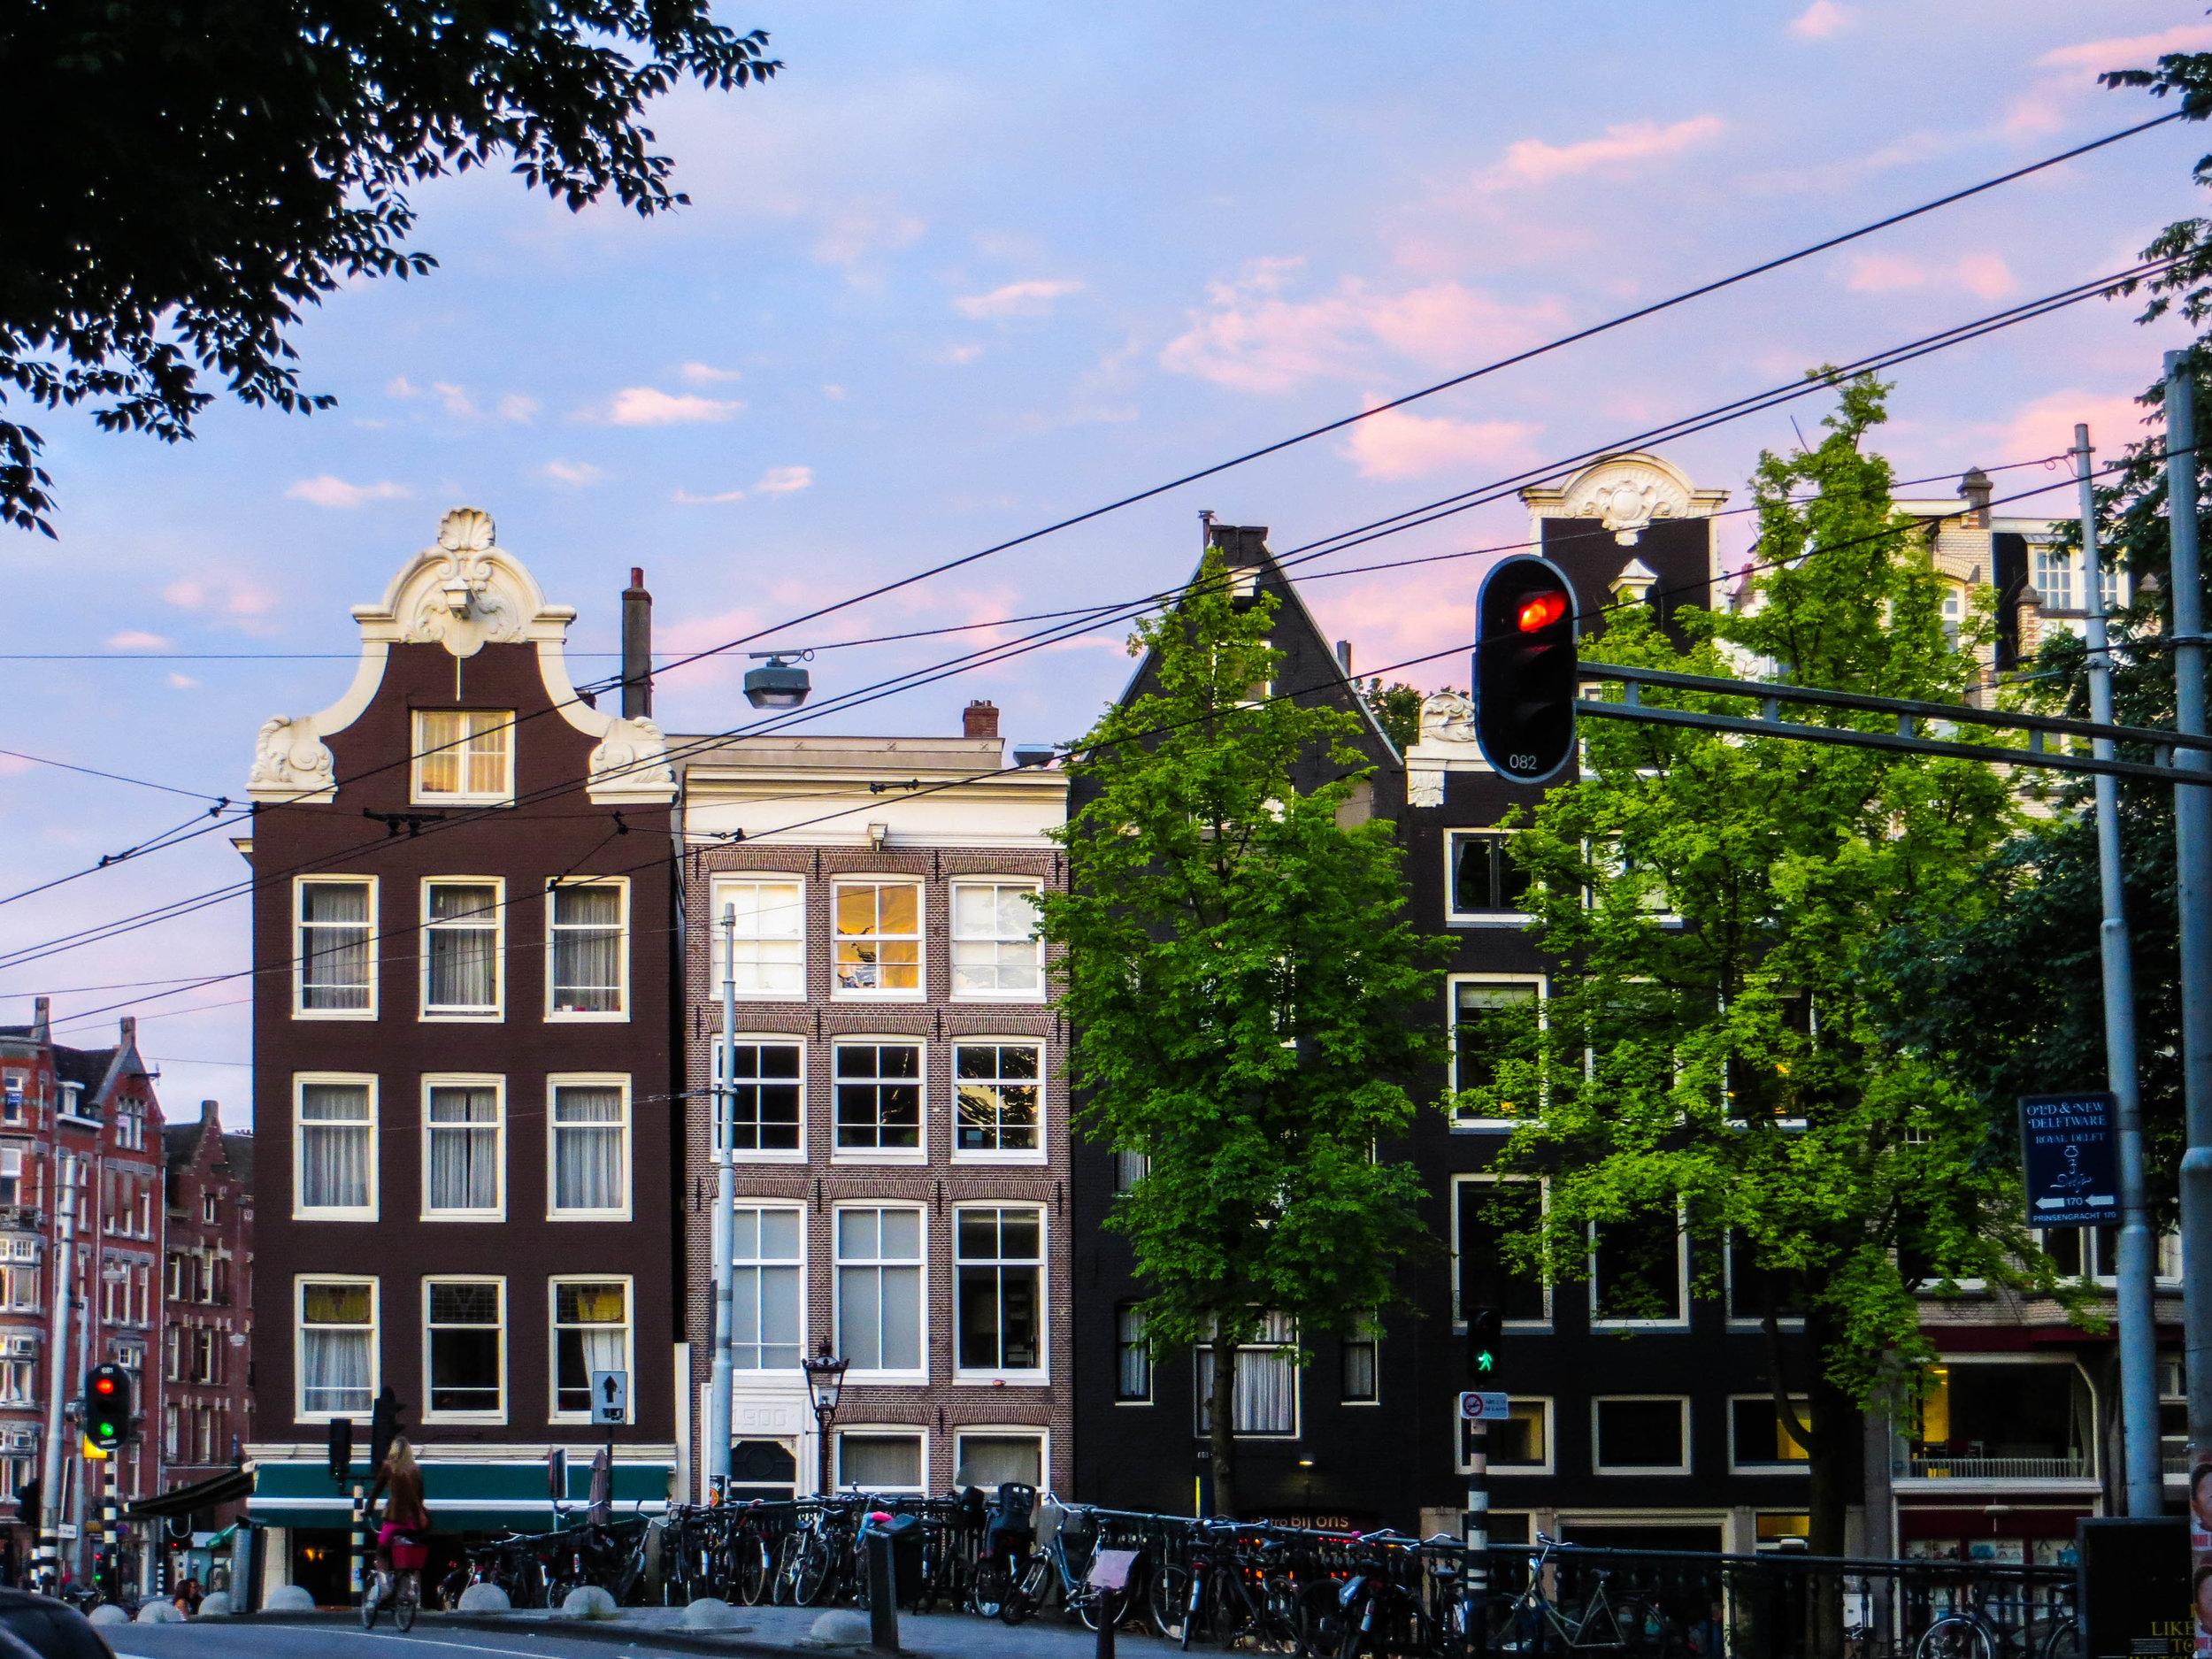 amsterdam-netherlands-street-photography-6-2.jpg